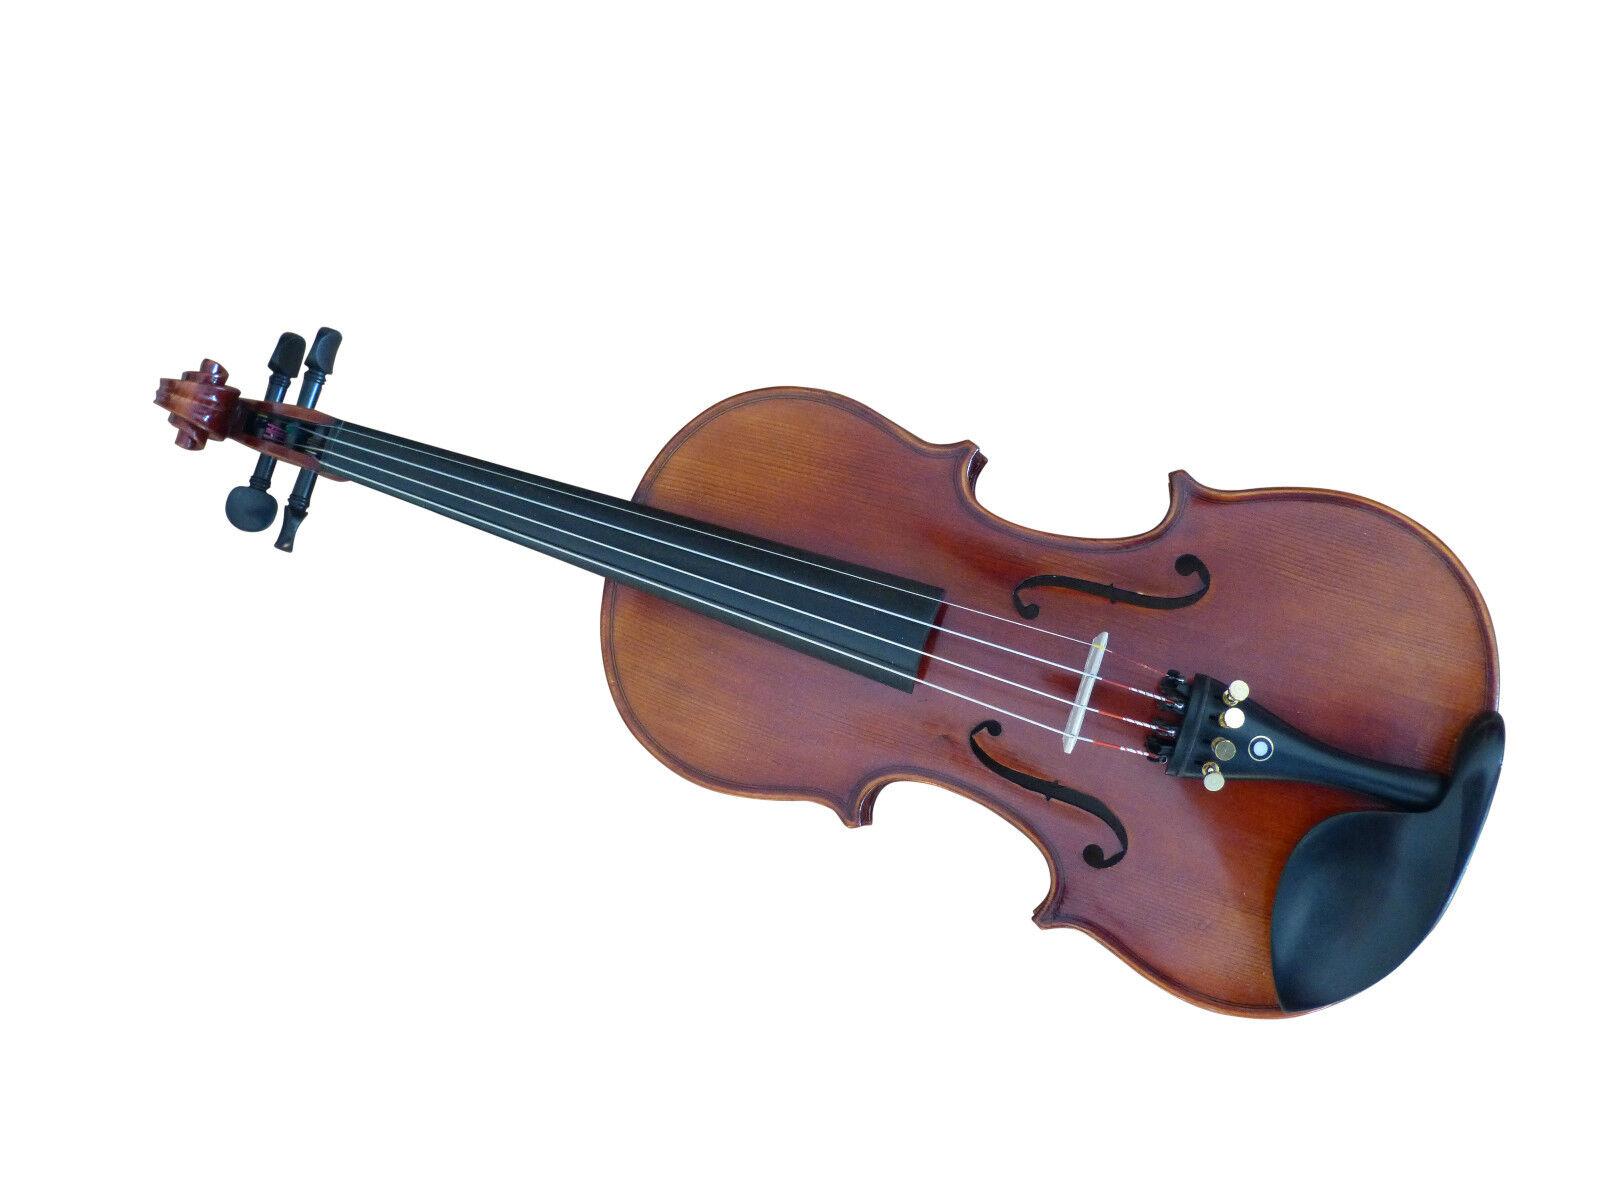 3 4 Geige Violine im Koffer, top Qualität, neu